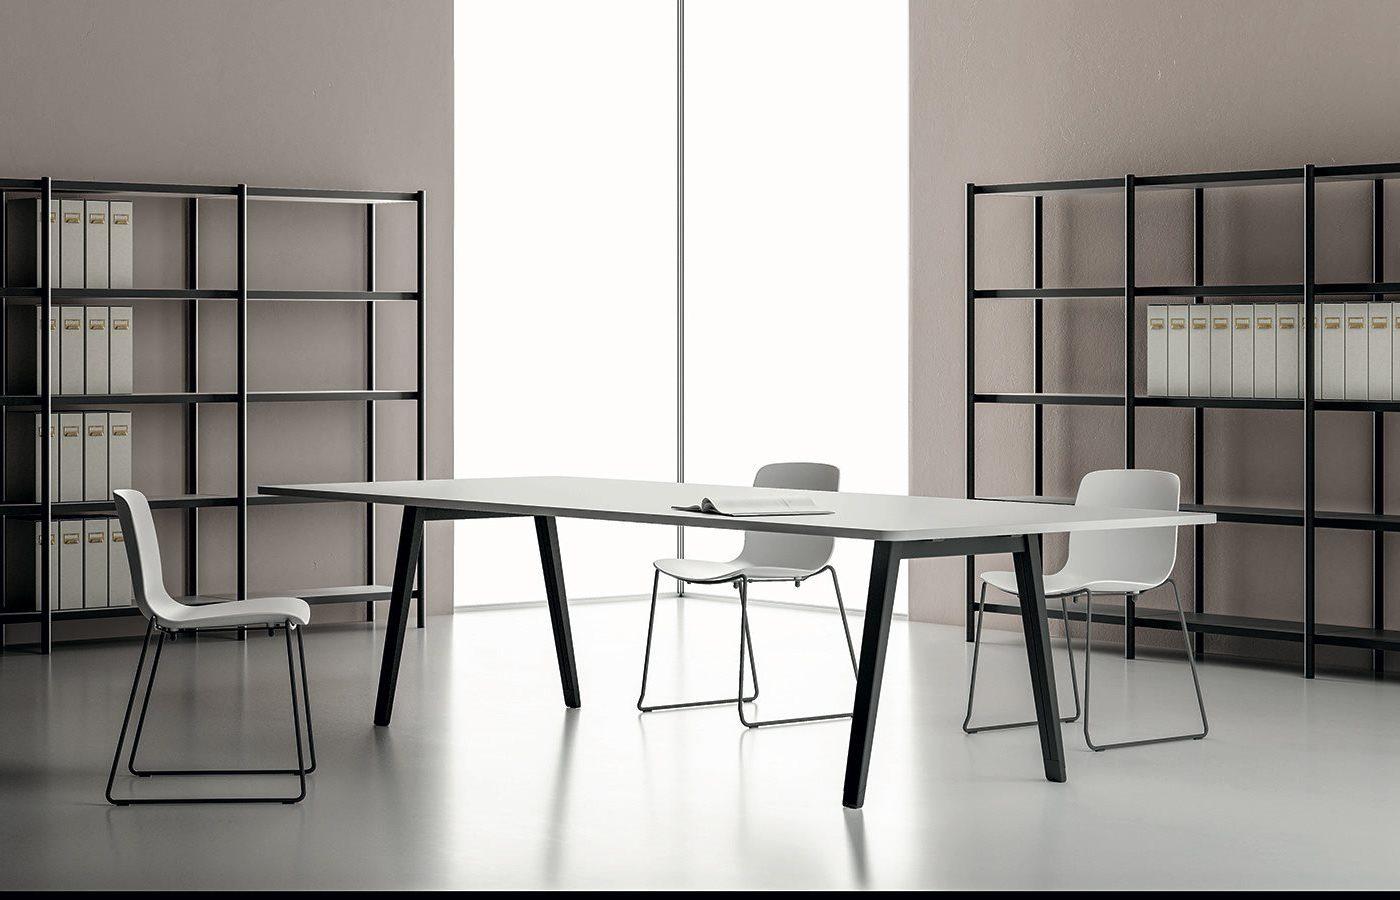 dvo_tavoli_DV990_workstation-table_gallery_16_zoom